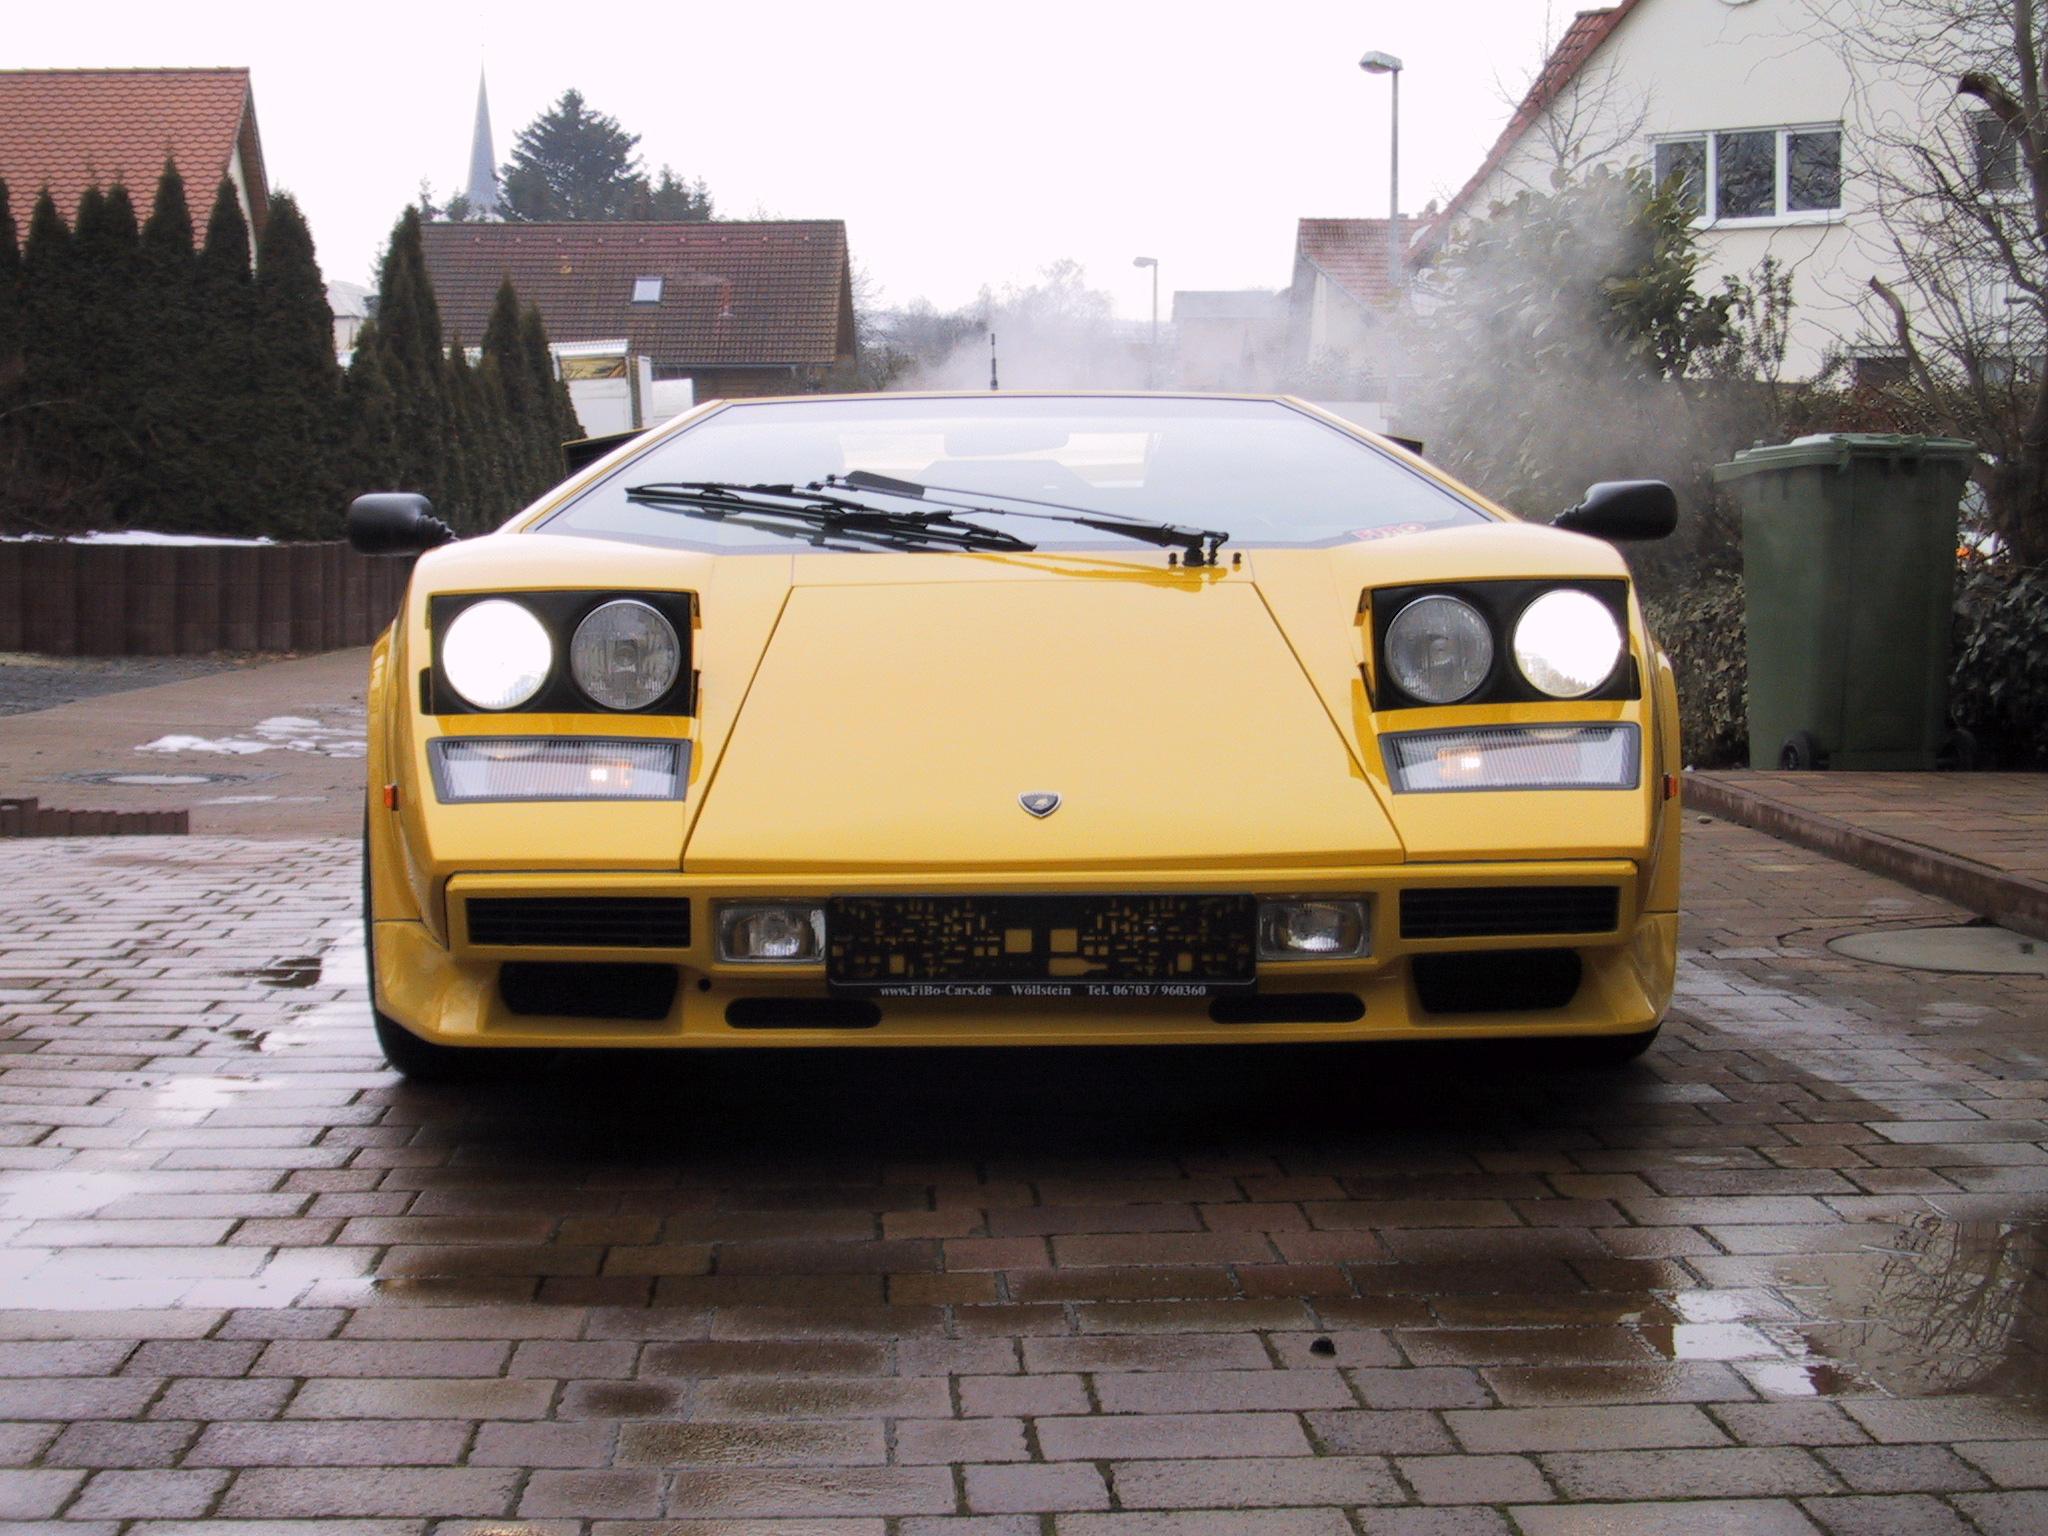 Lambobilder%20006_0 Wonderful Lamborghini Countach Strohm De Rella Cars Trend